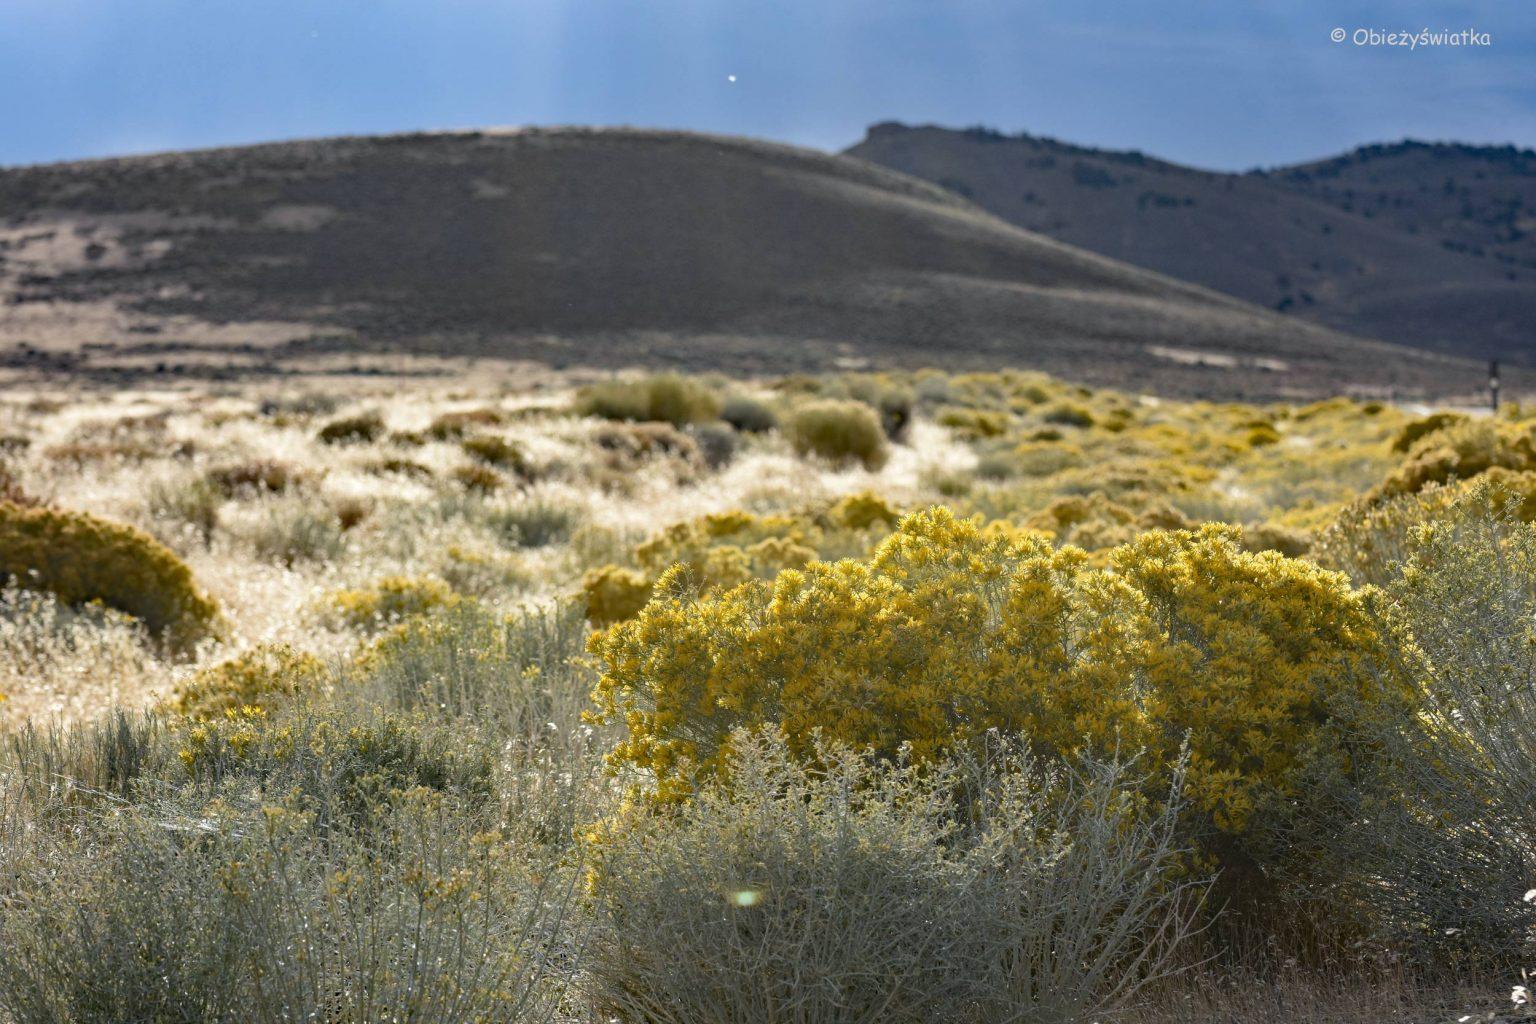 Sagebrush in Nevada